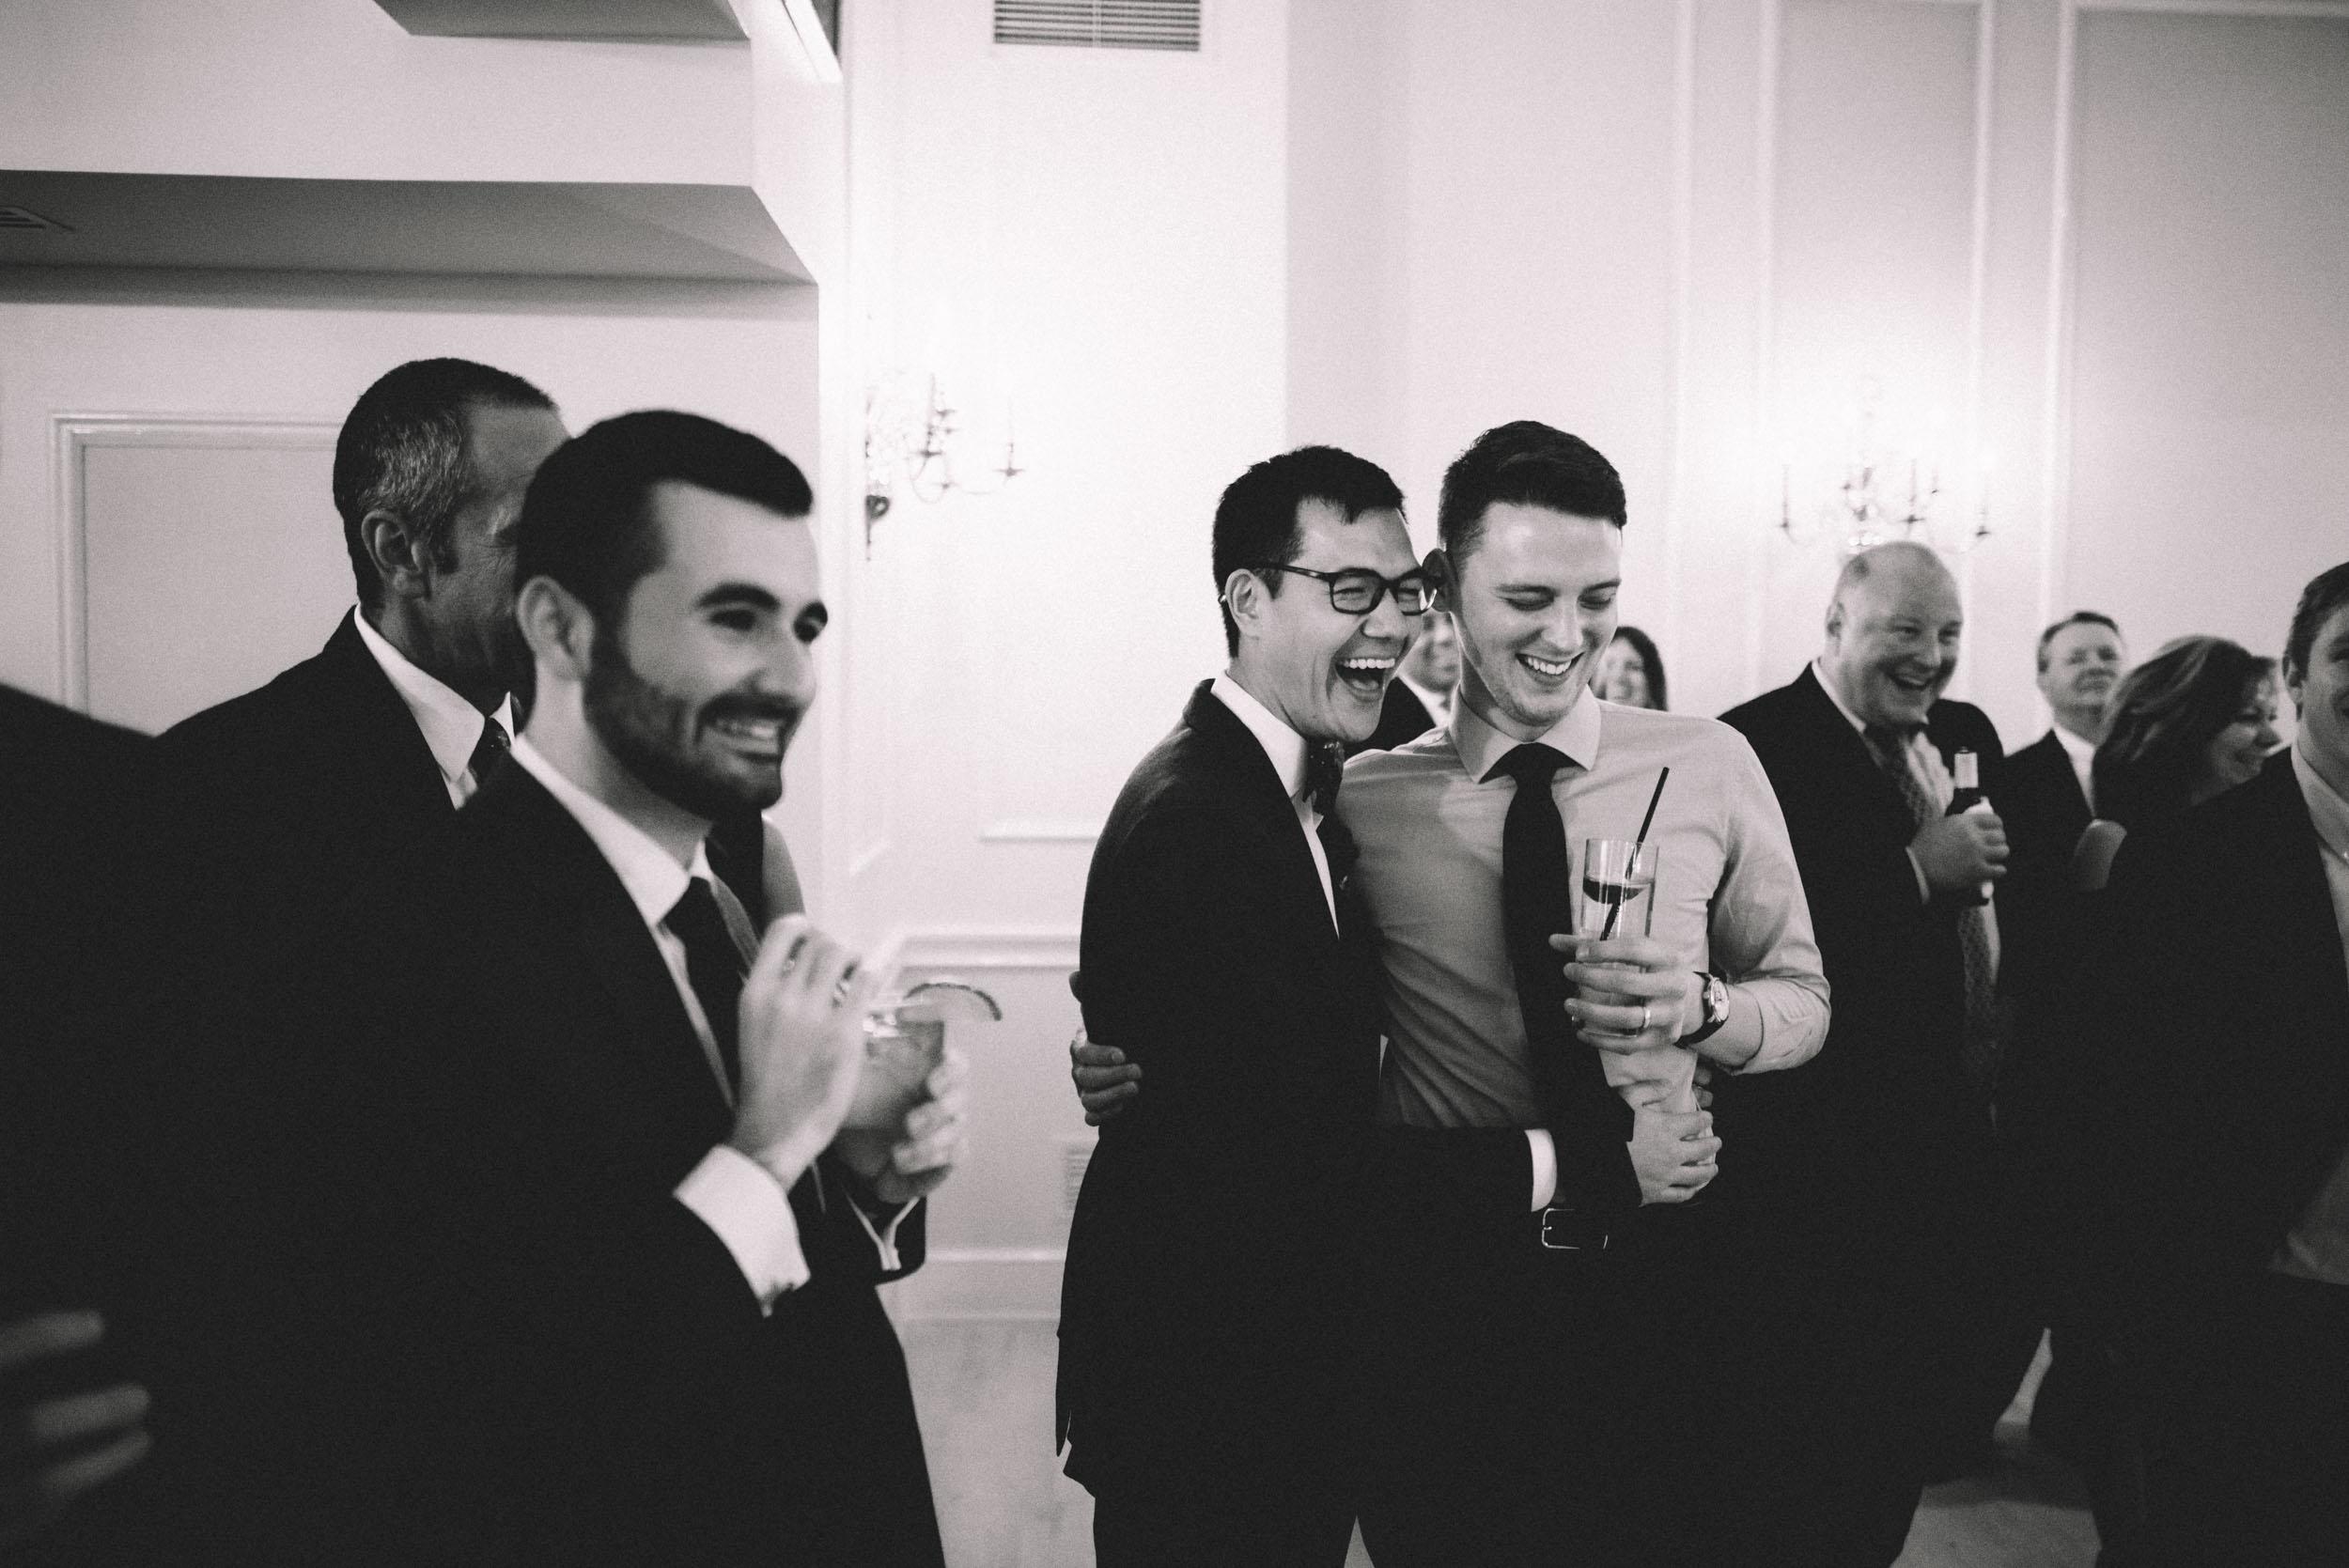 Dumbarton-House-wedding-76.jpg